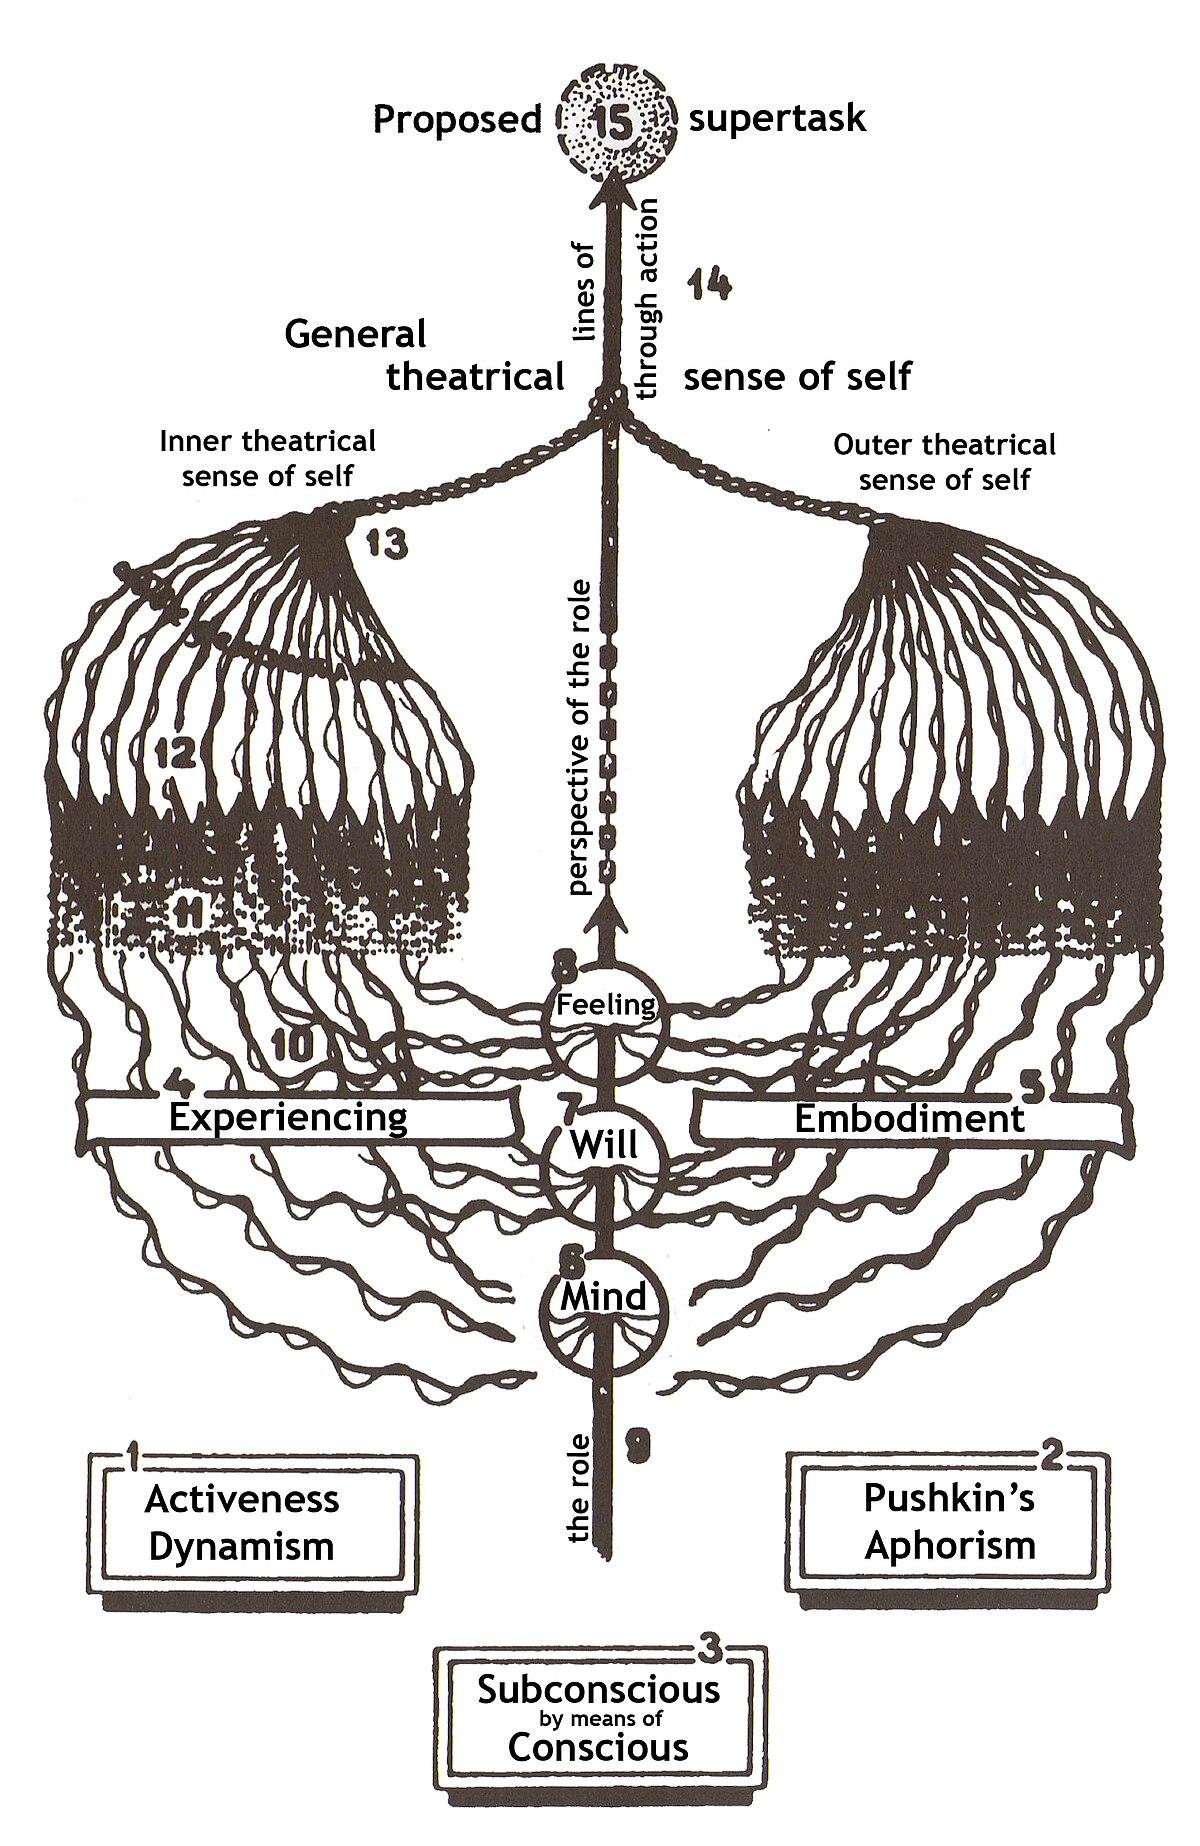 Stanislavski's Life and Impact on Theater